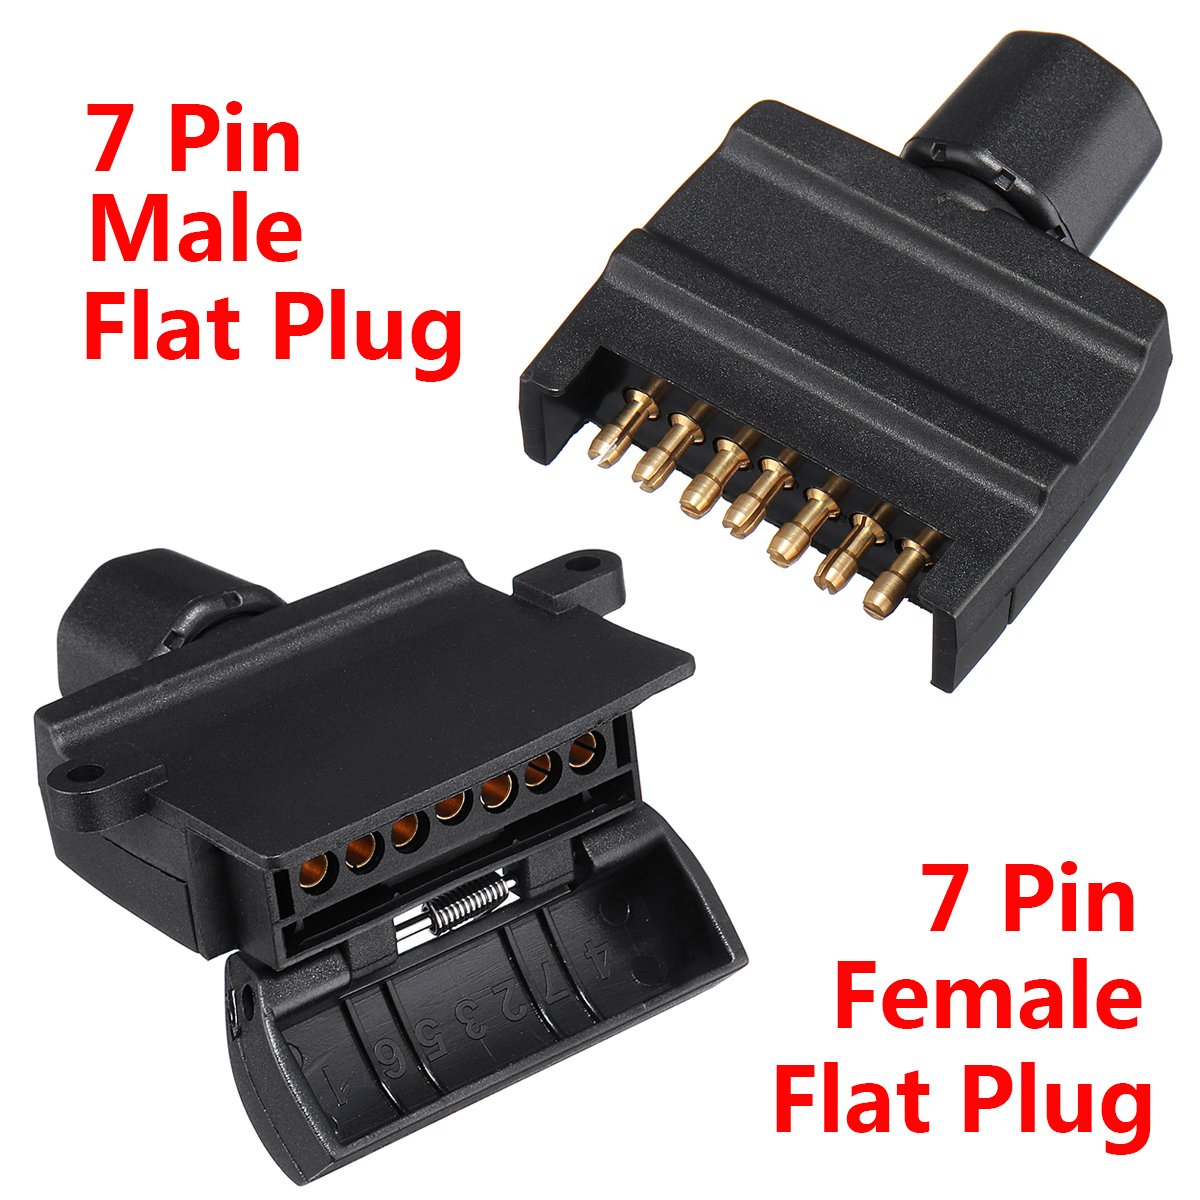 7 Pin Flat Male 7 Pin Plug Flat Female Trailer Connector